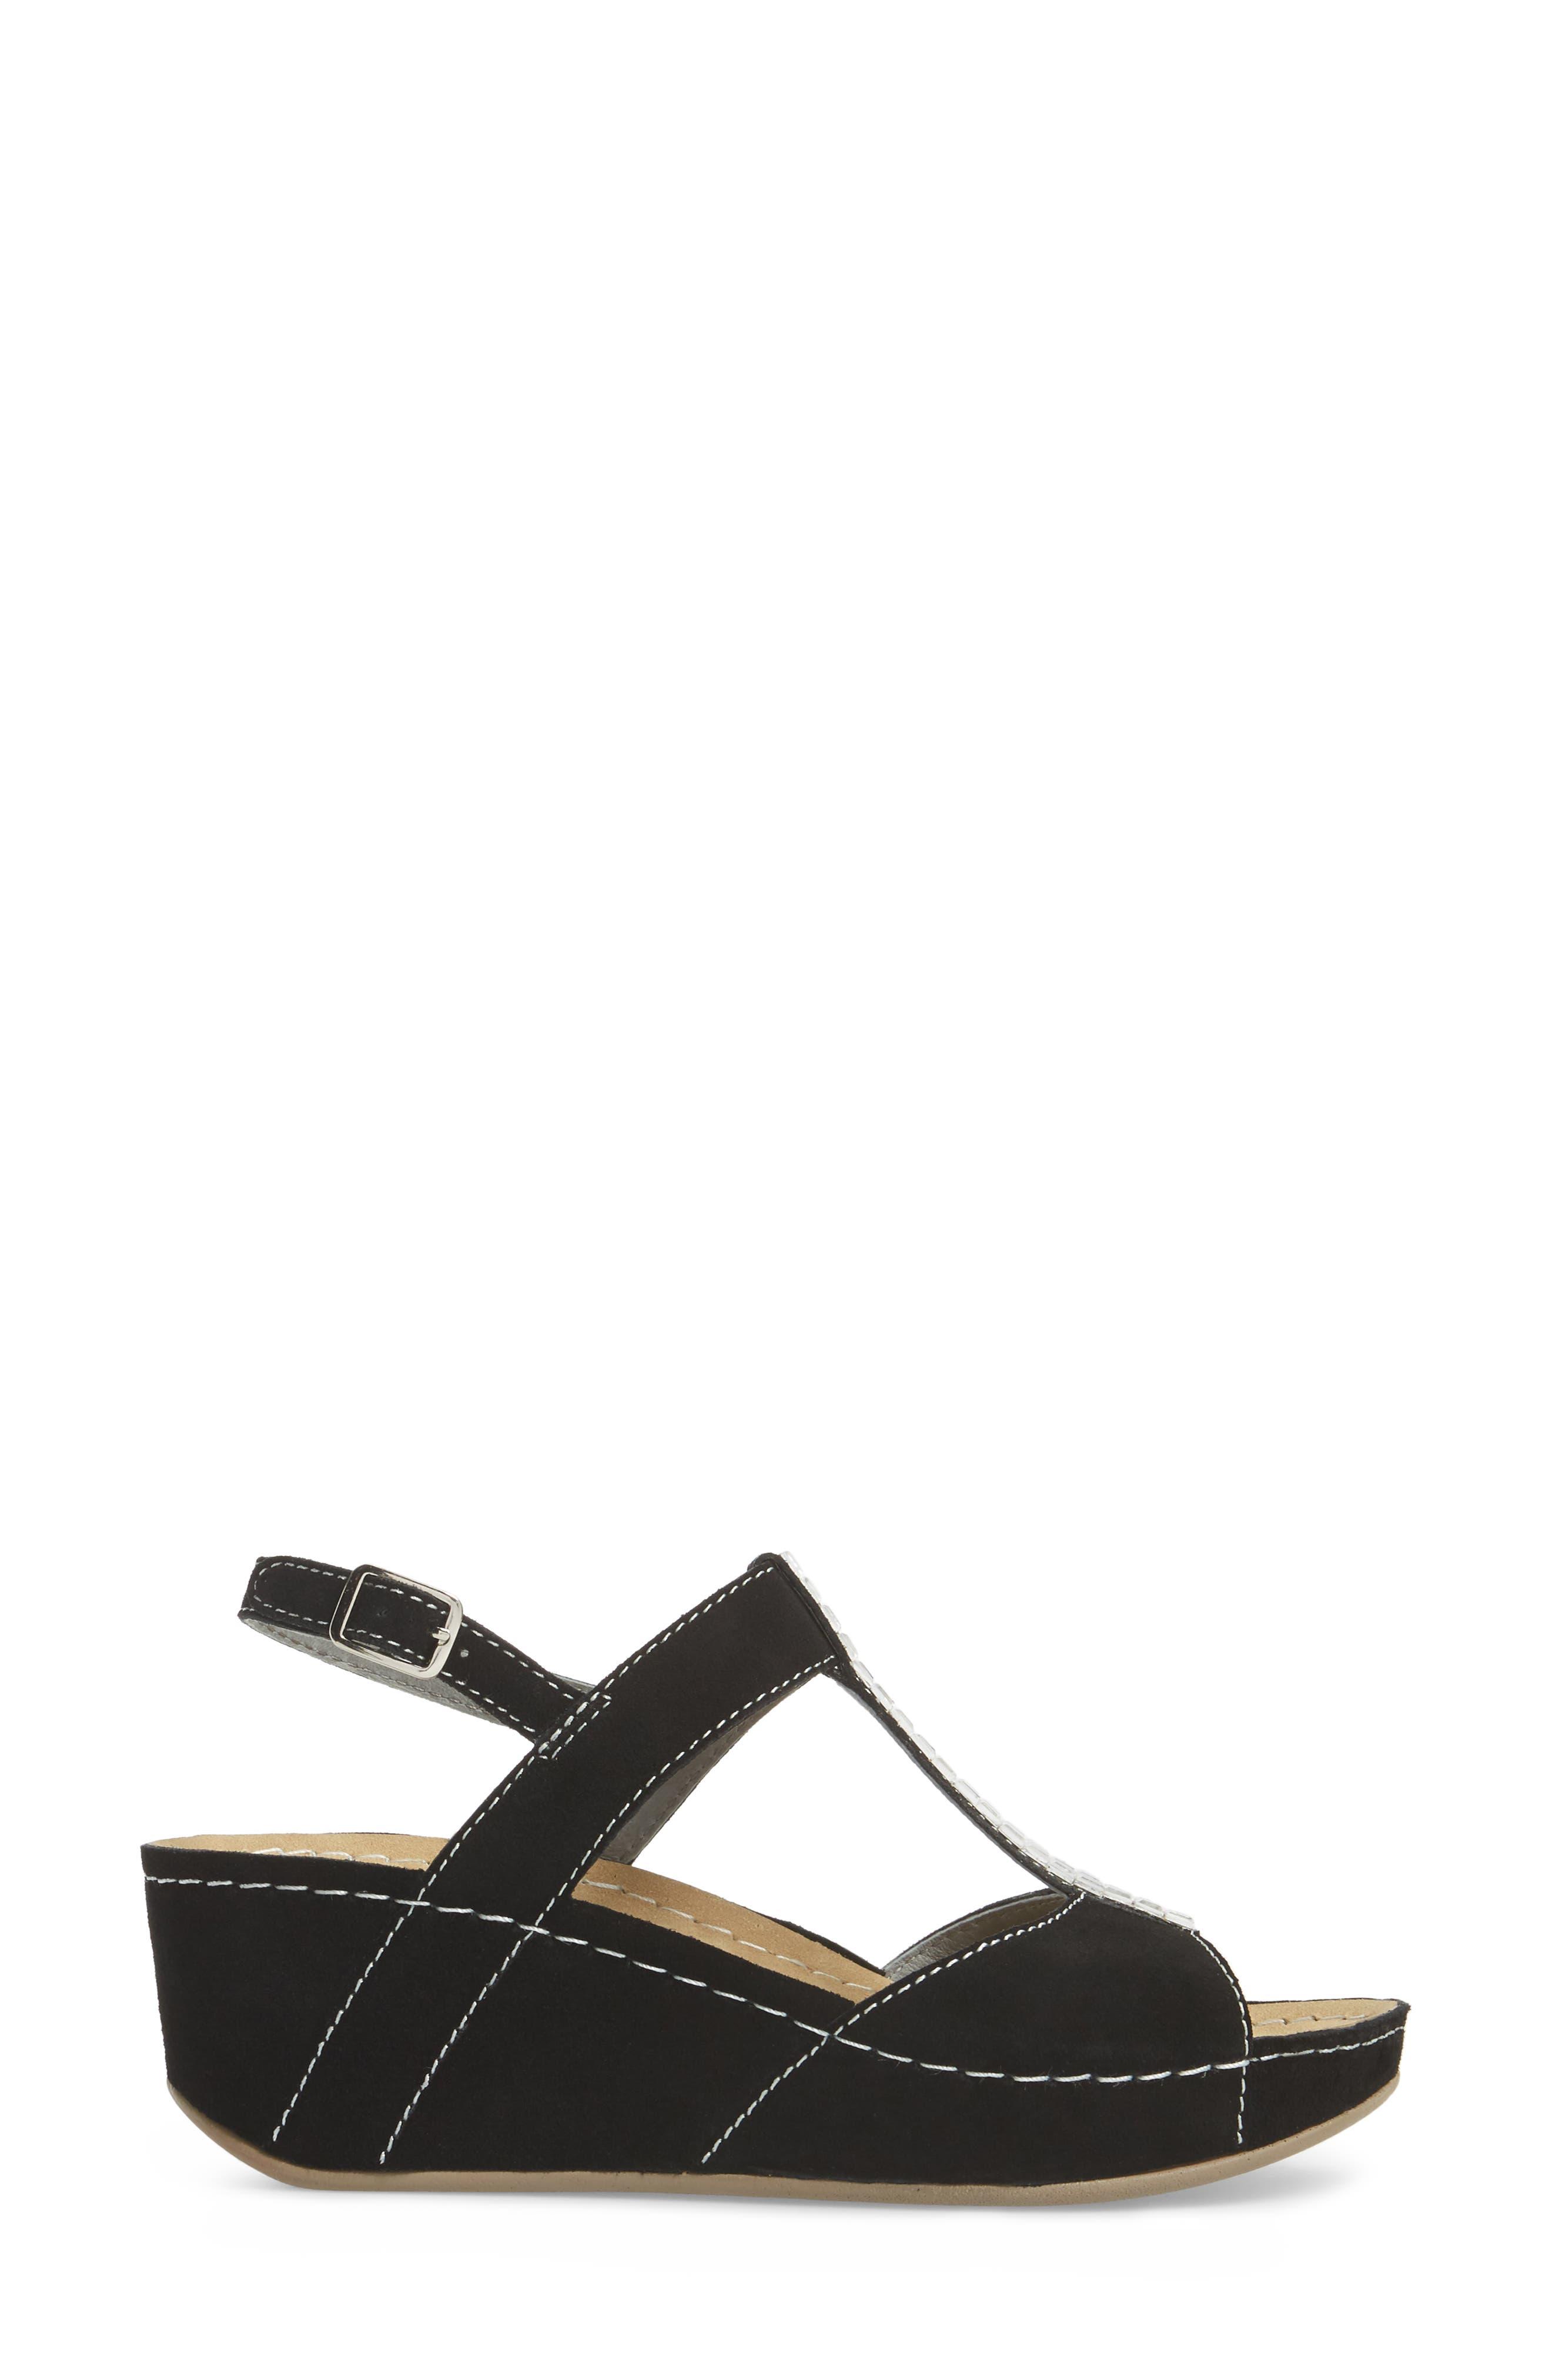 DAVID TATE, Bubbly Embellished T-Strap Wedge Sandal, Alternate thumbnail 3, color, BLACK SUEDE